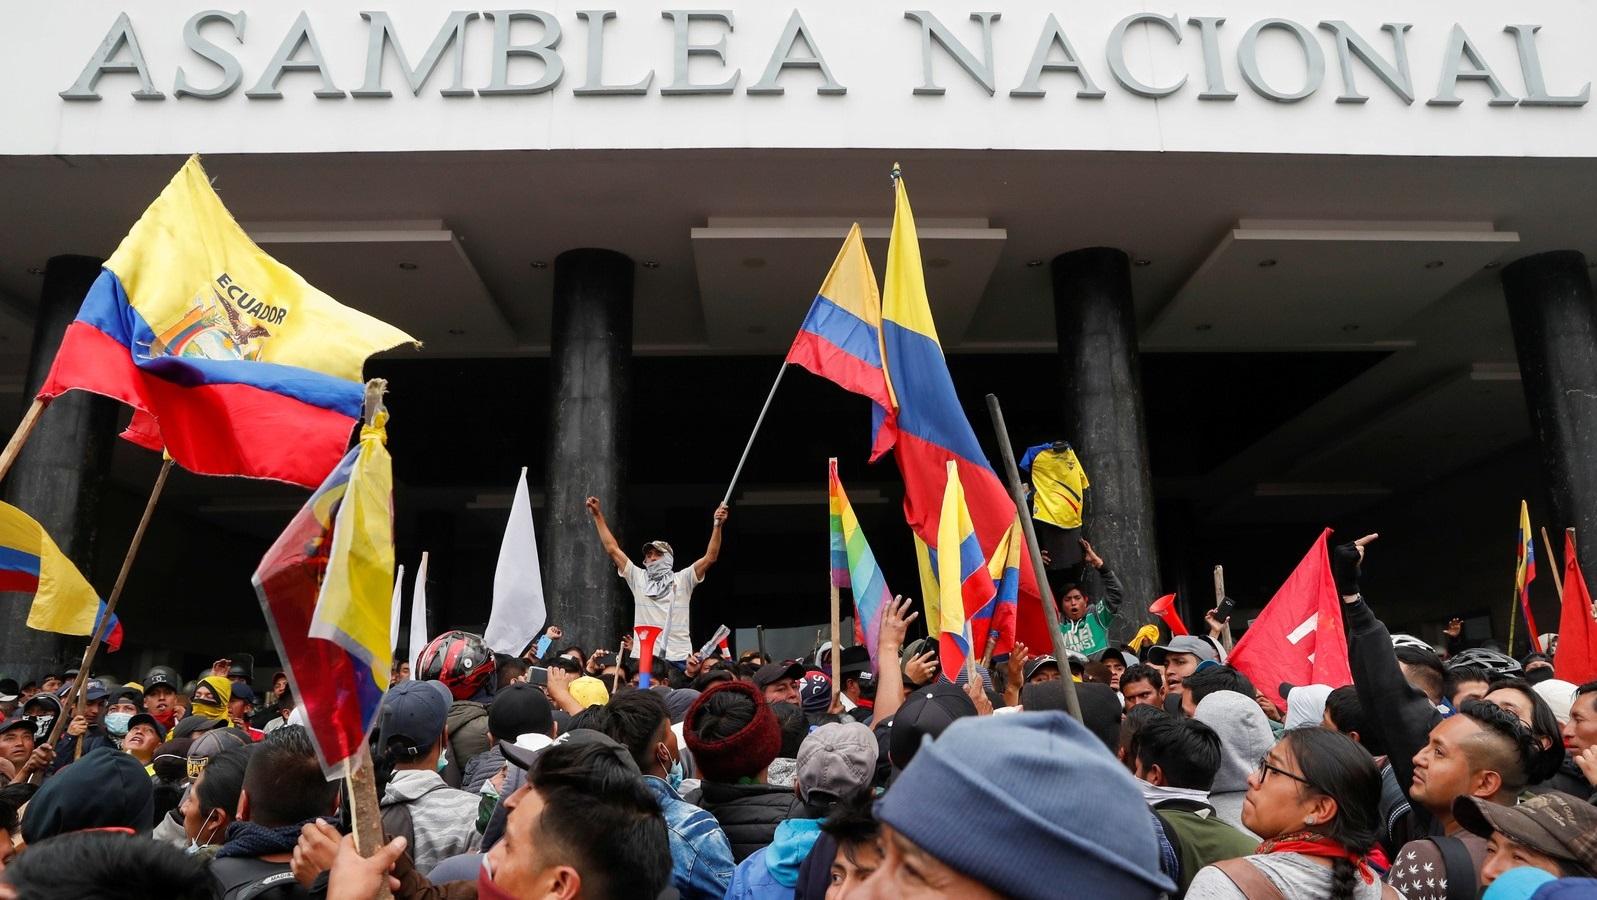 Todo o apoio ao povo do Equador